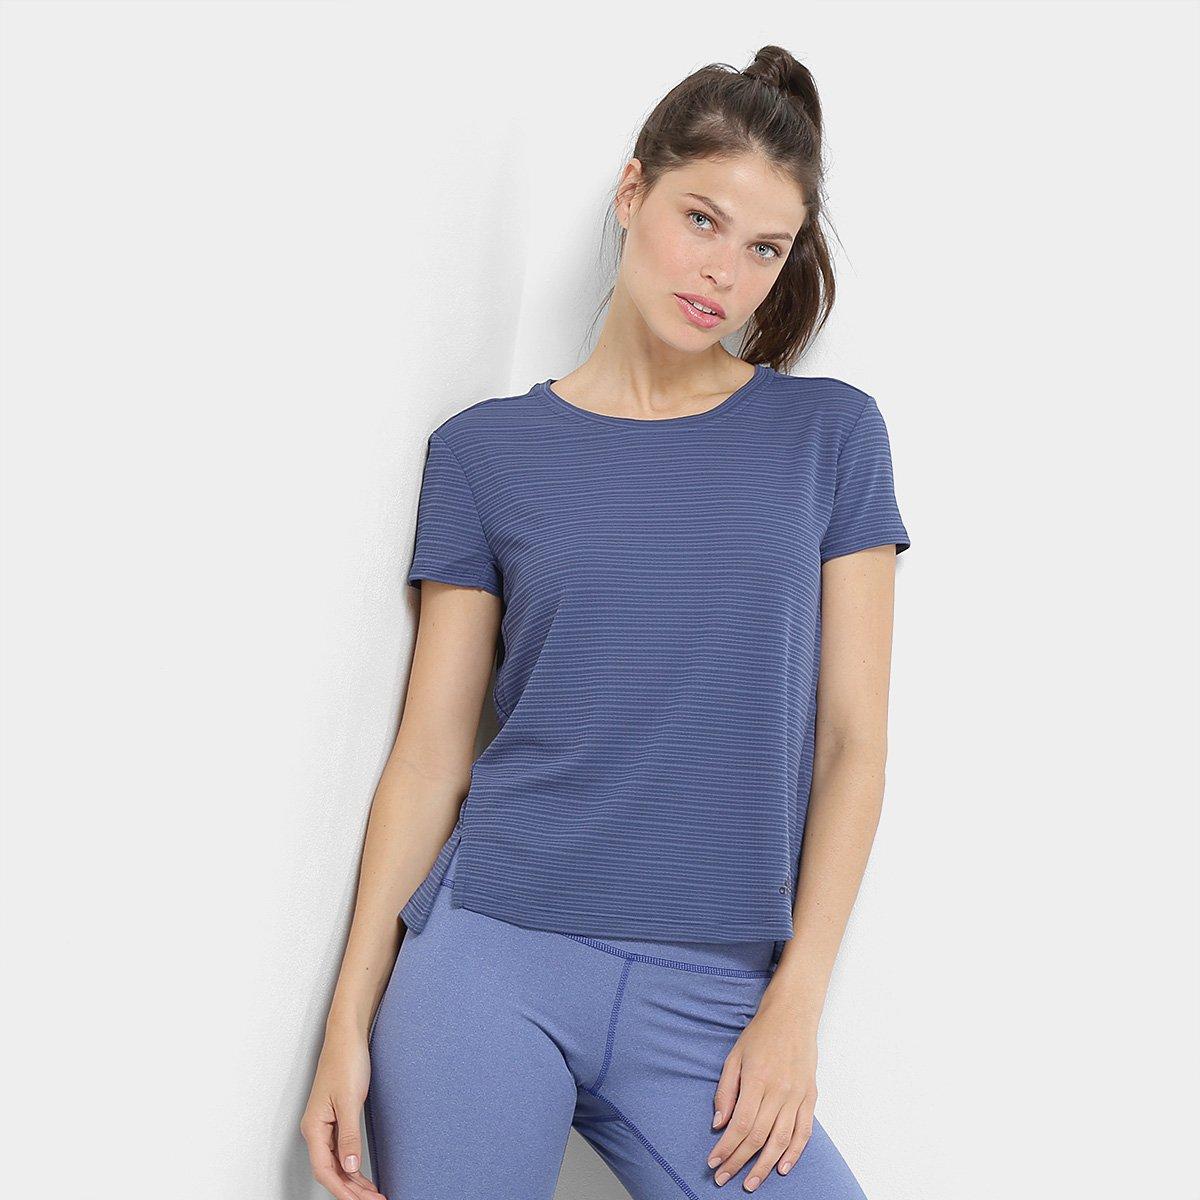 e61e0690982 Camiseta Adidas Freelift Chill Feminina